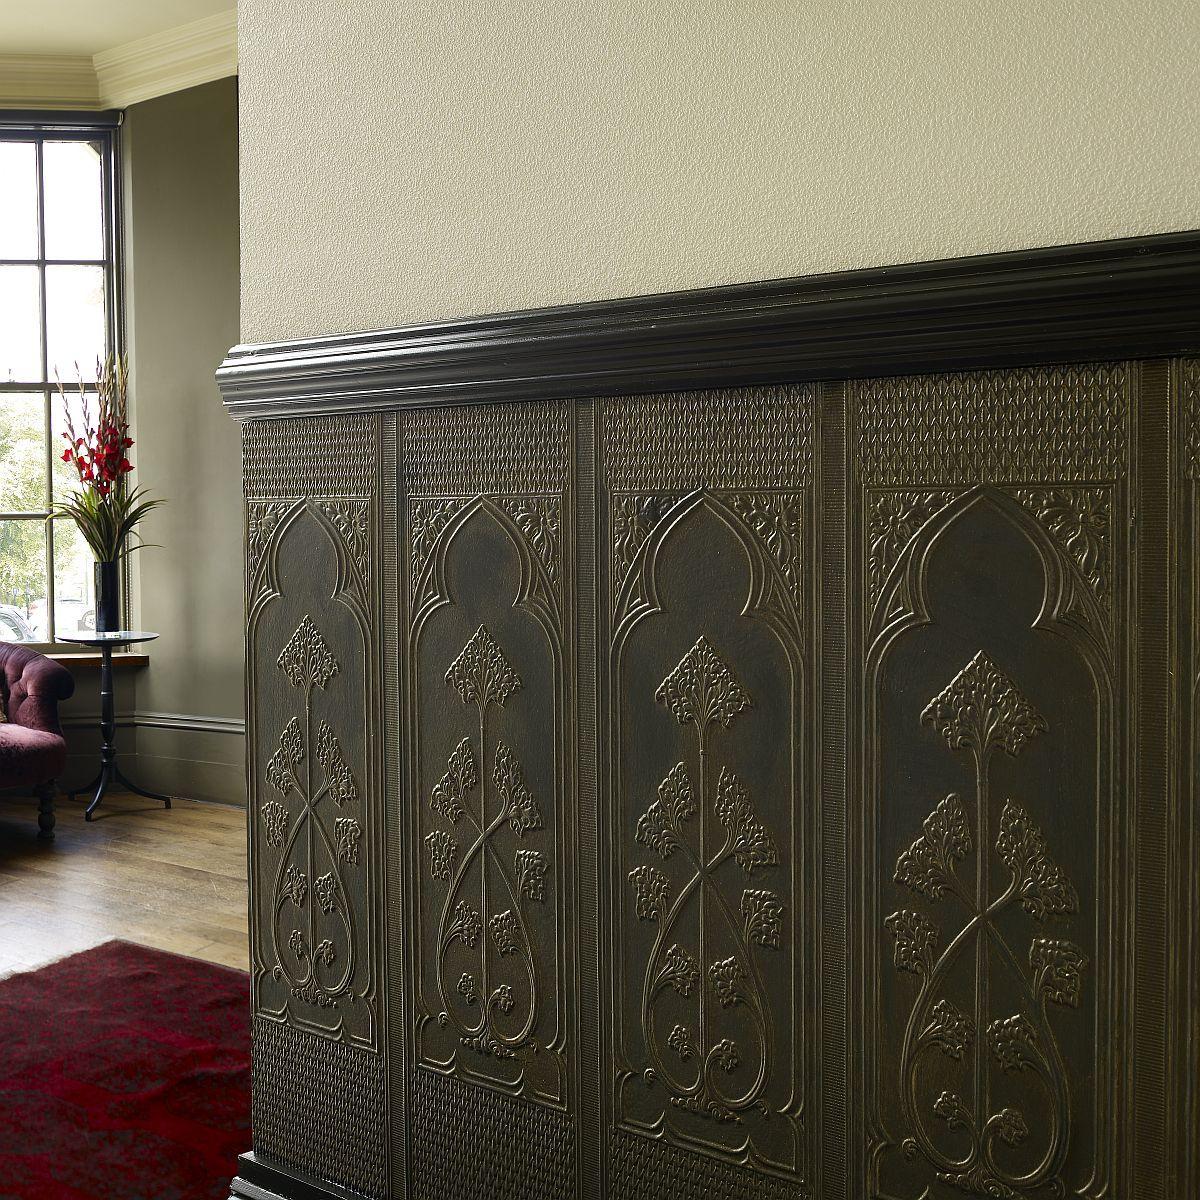 lincrusta gothic dado rd1967. Black Bedroom Furniture Sets. Home Design Ideas